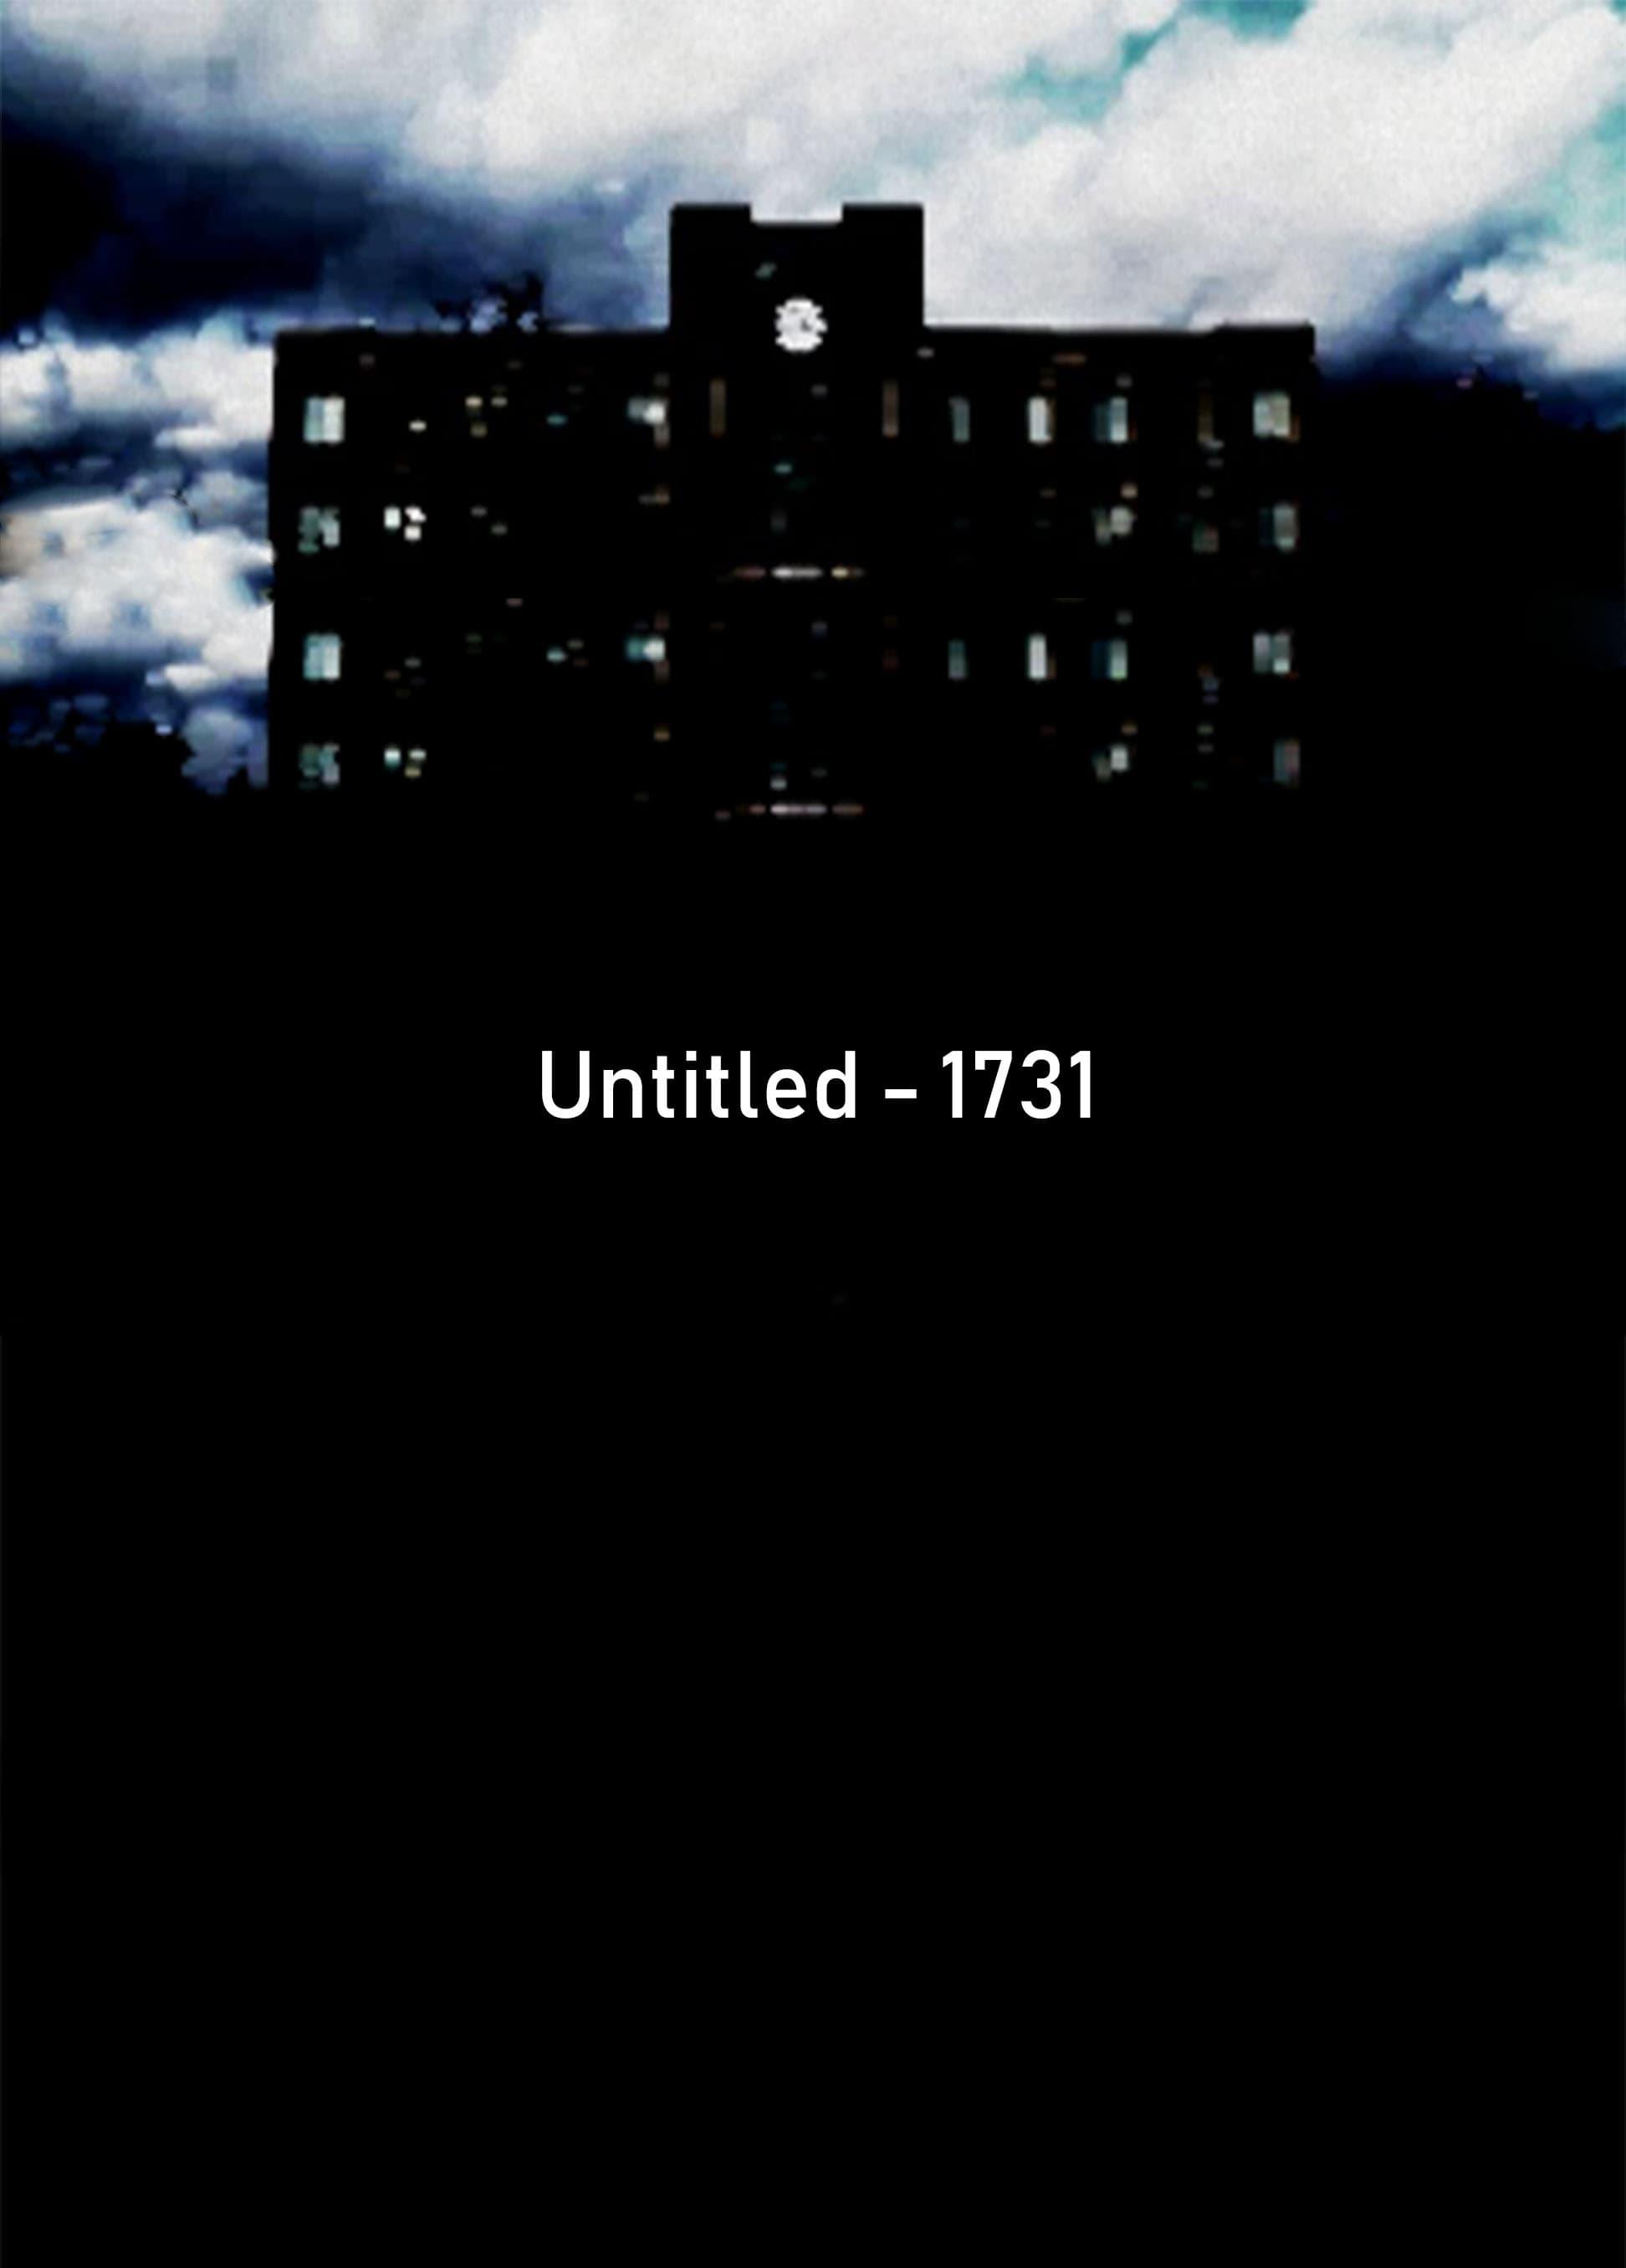 Untitled-1173